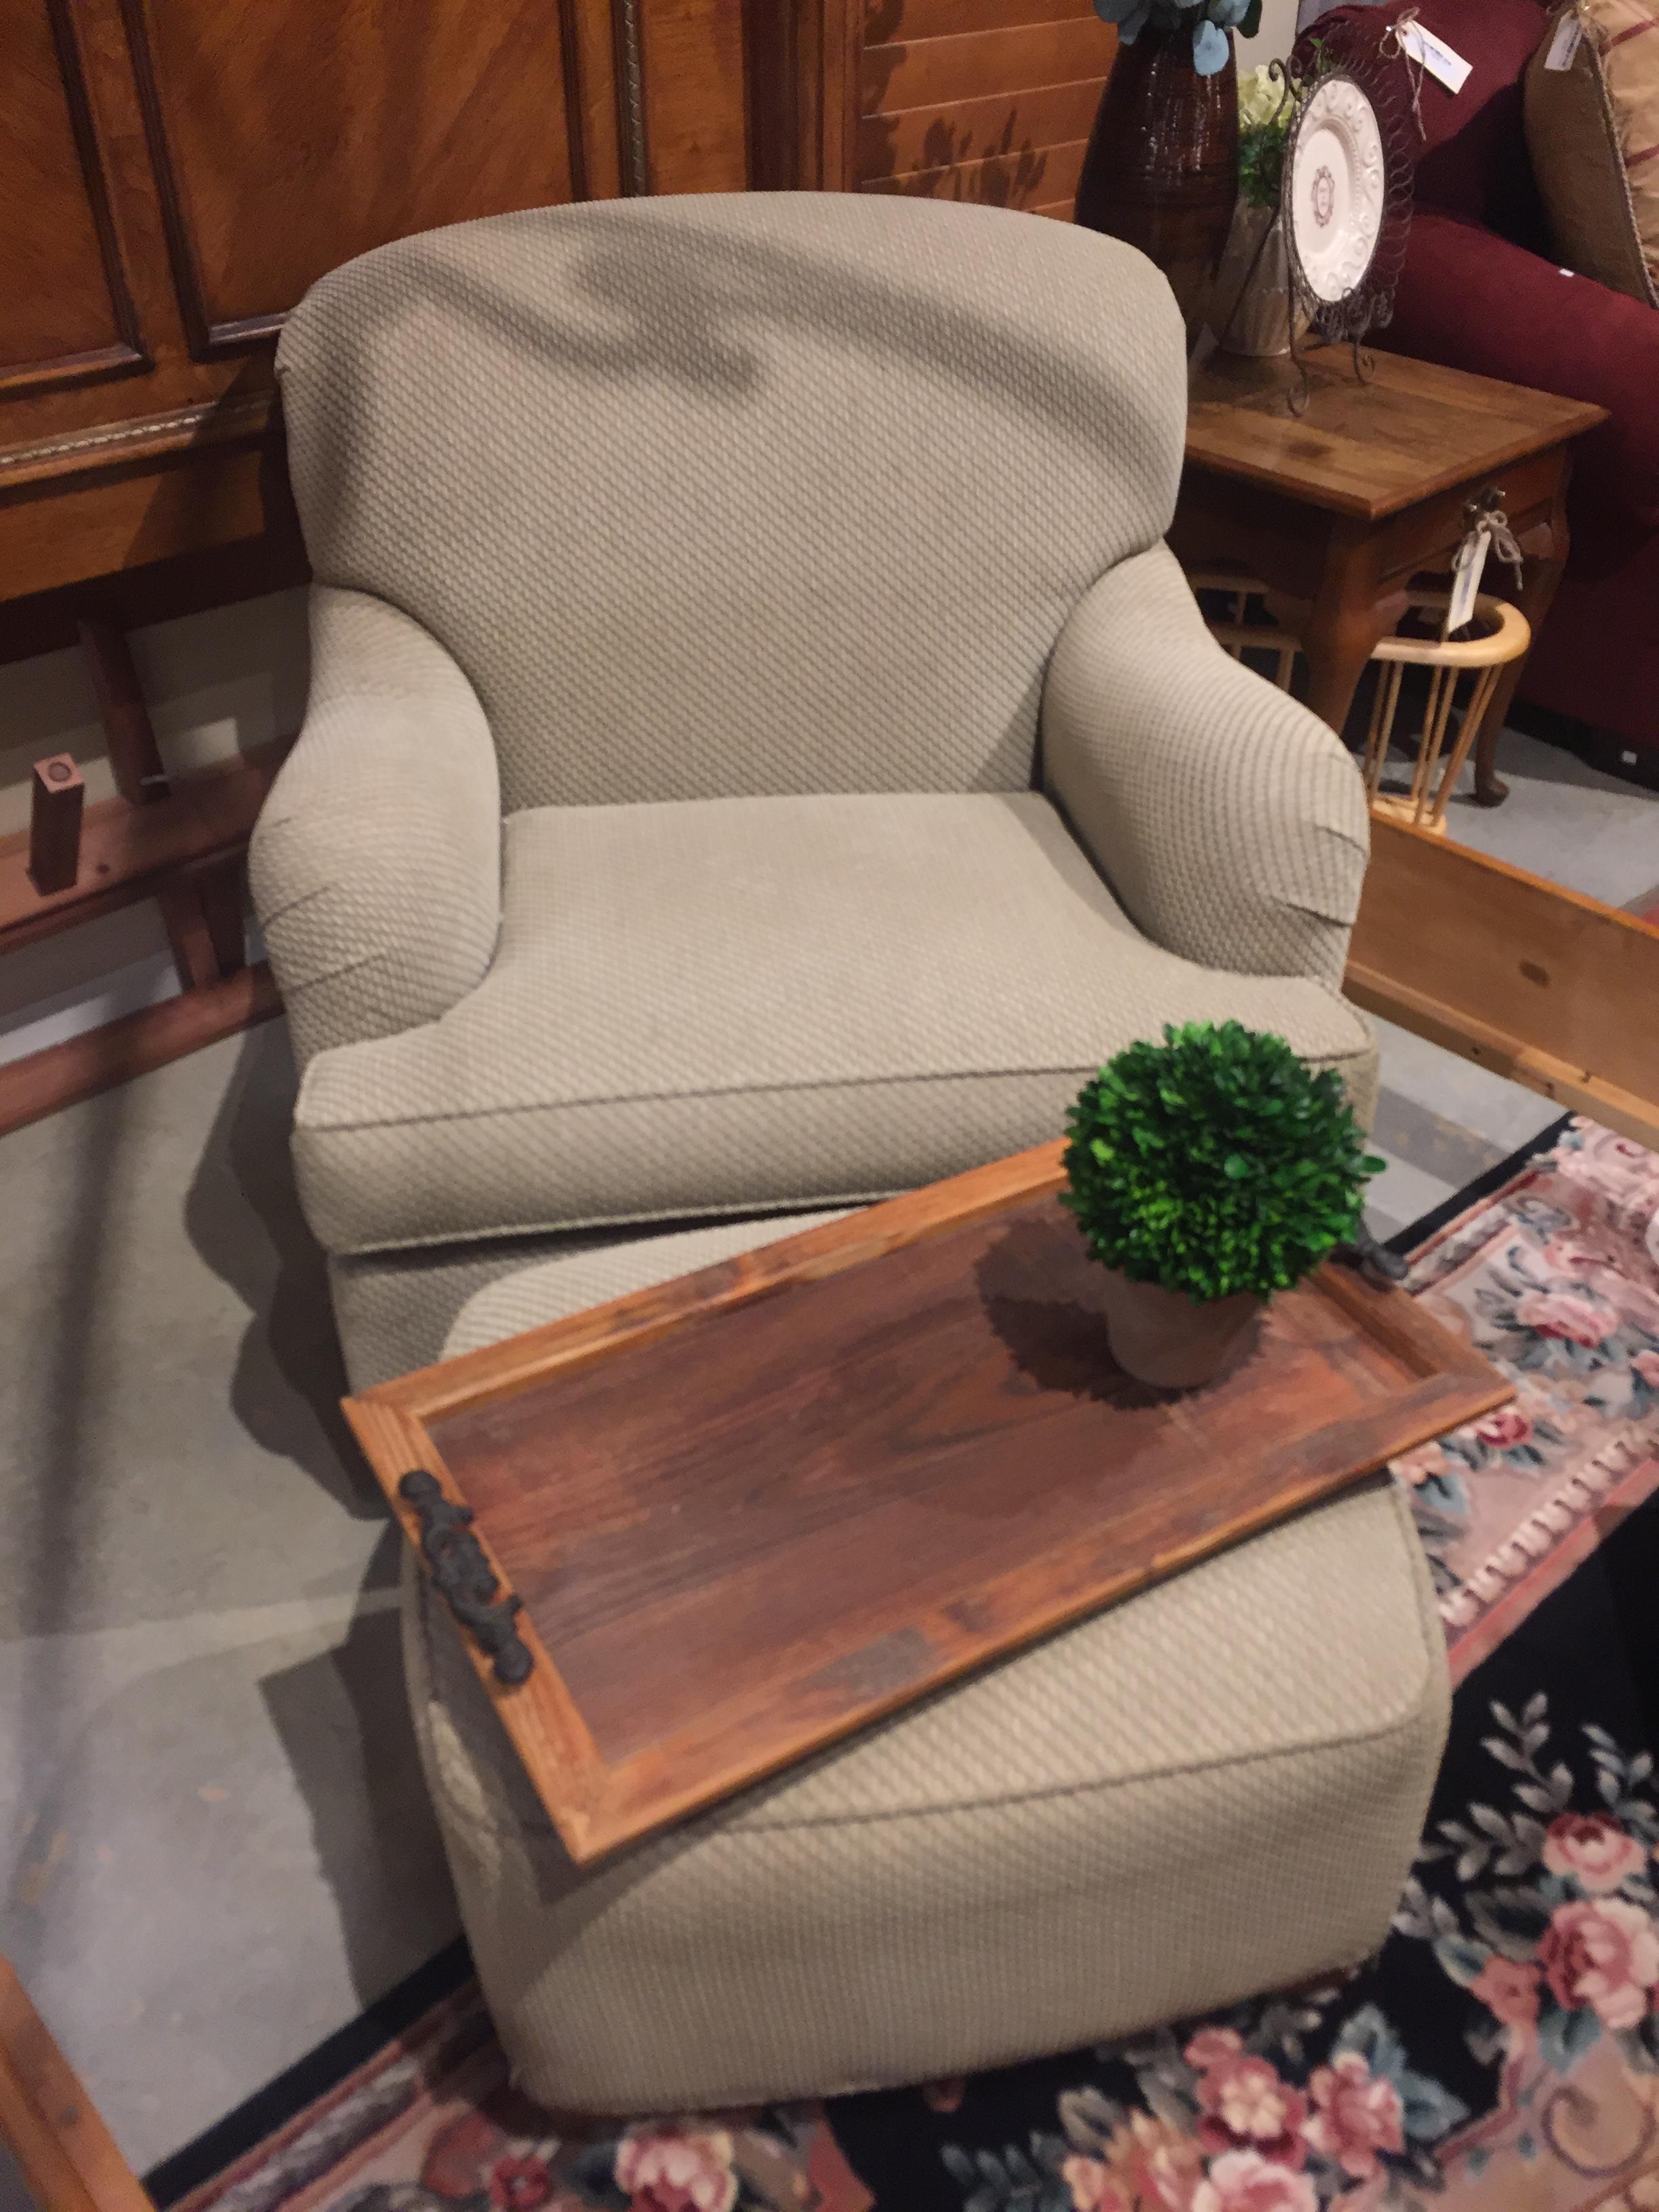 Ethan Allen Chair & Ottoman $549.95 - C1004 22085